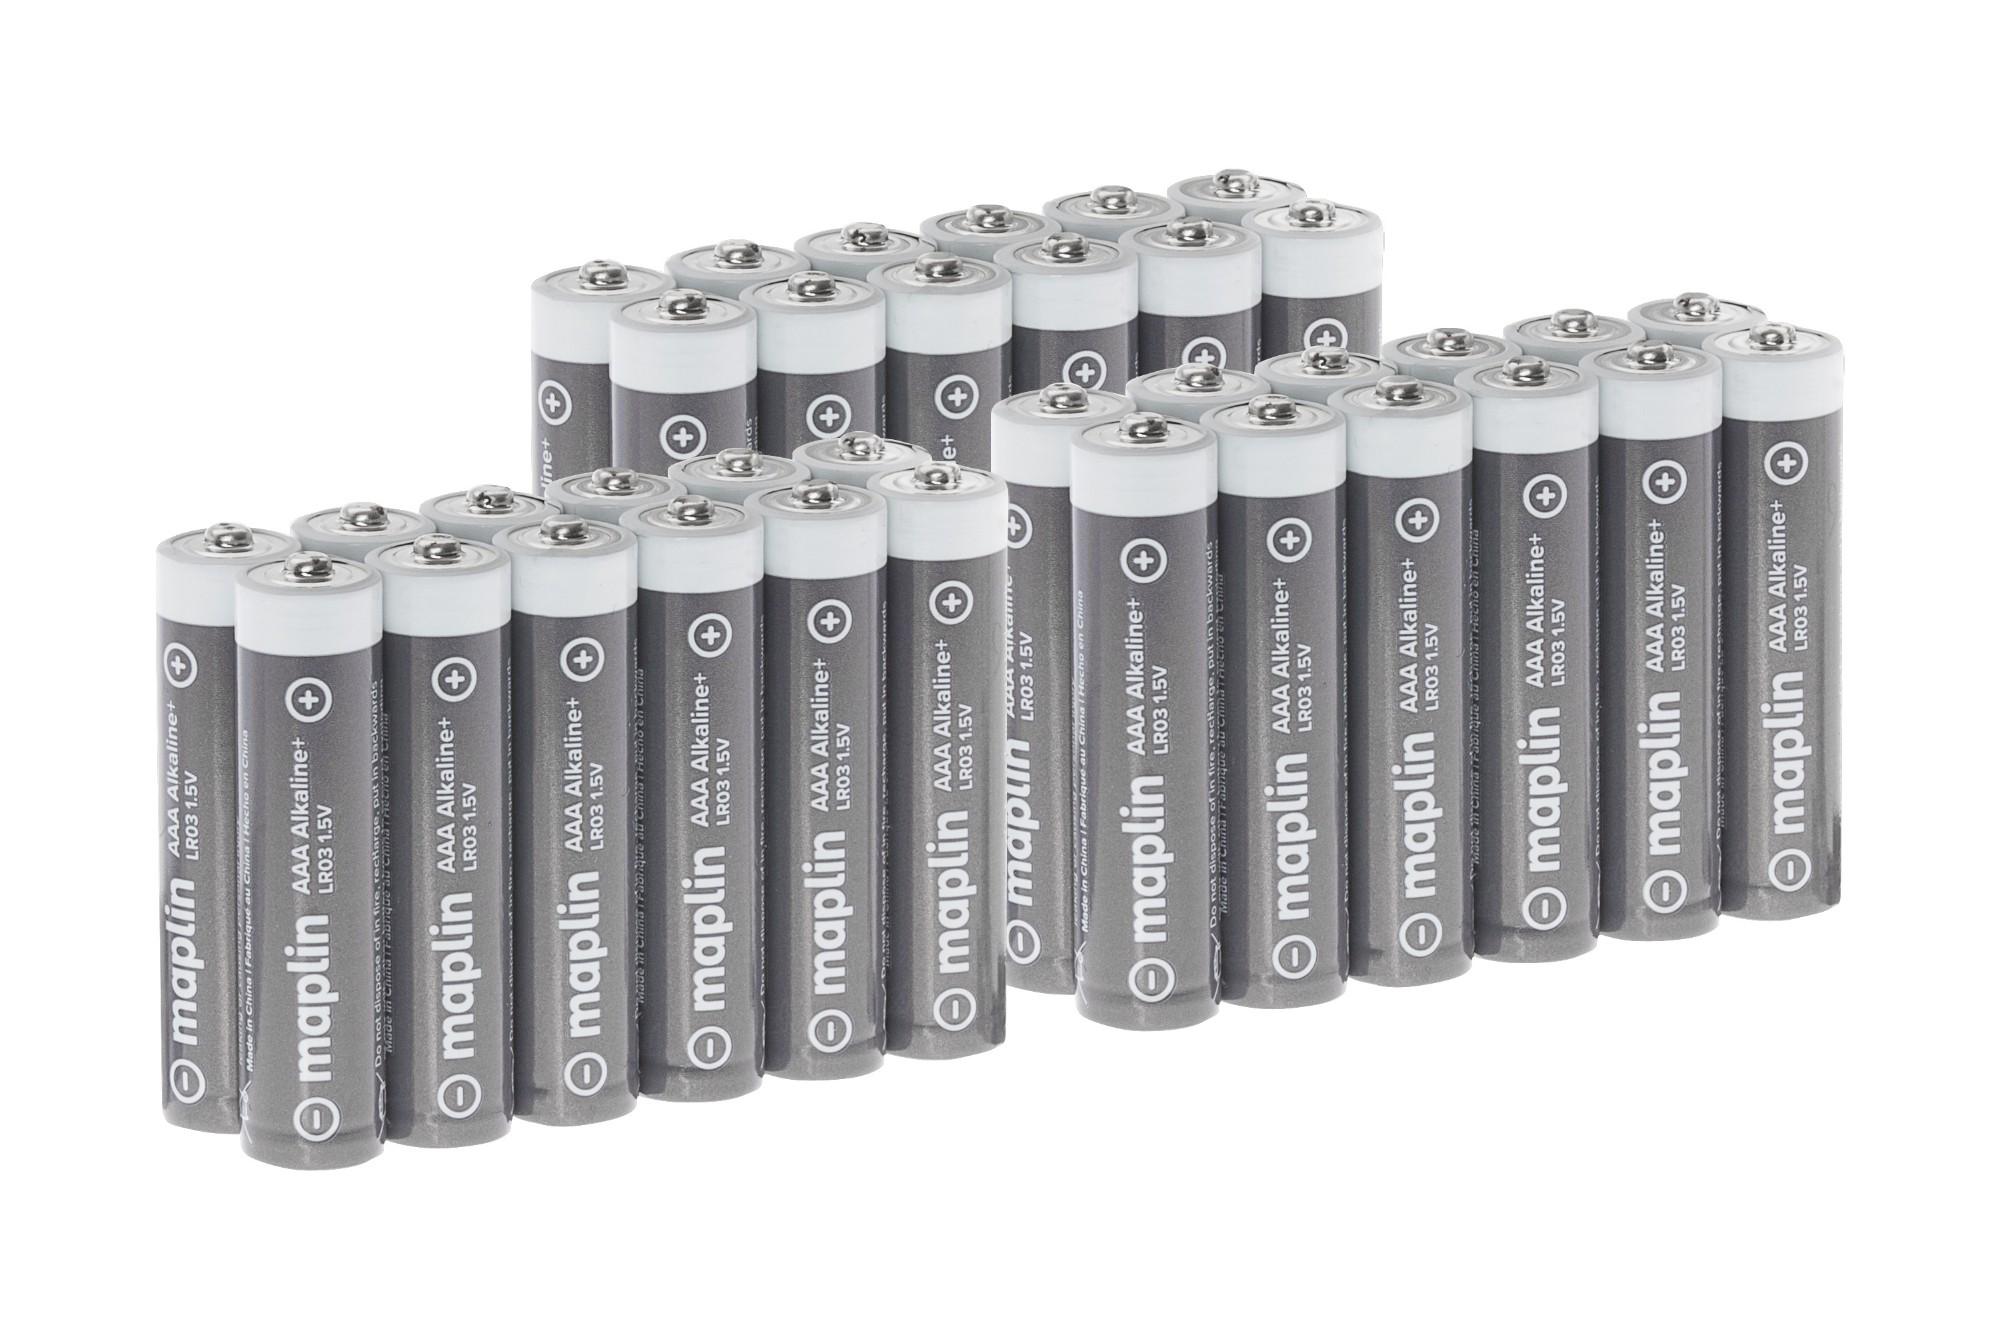 MAPLIN Extra Long Life High Performance Alkaline AAA Batteries - Pack of 36 (3 x 12)